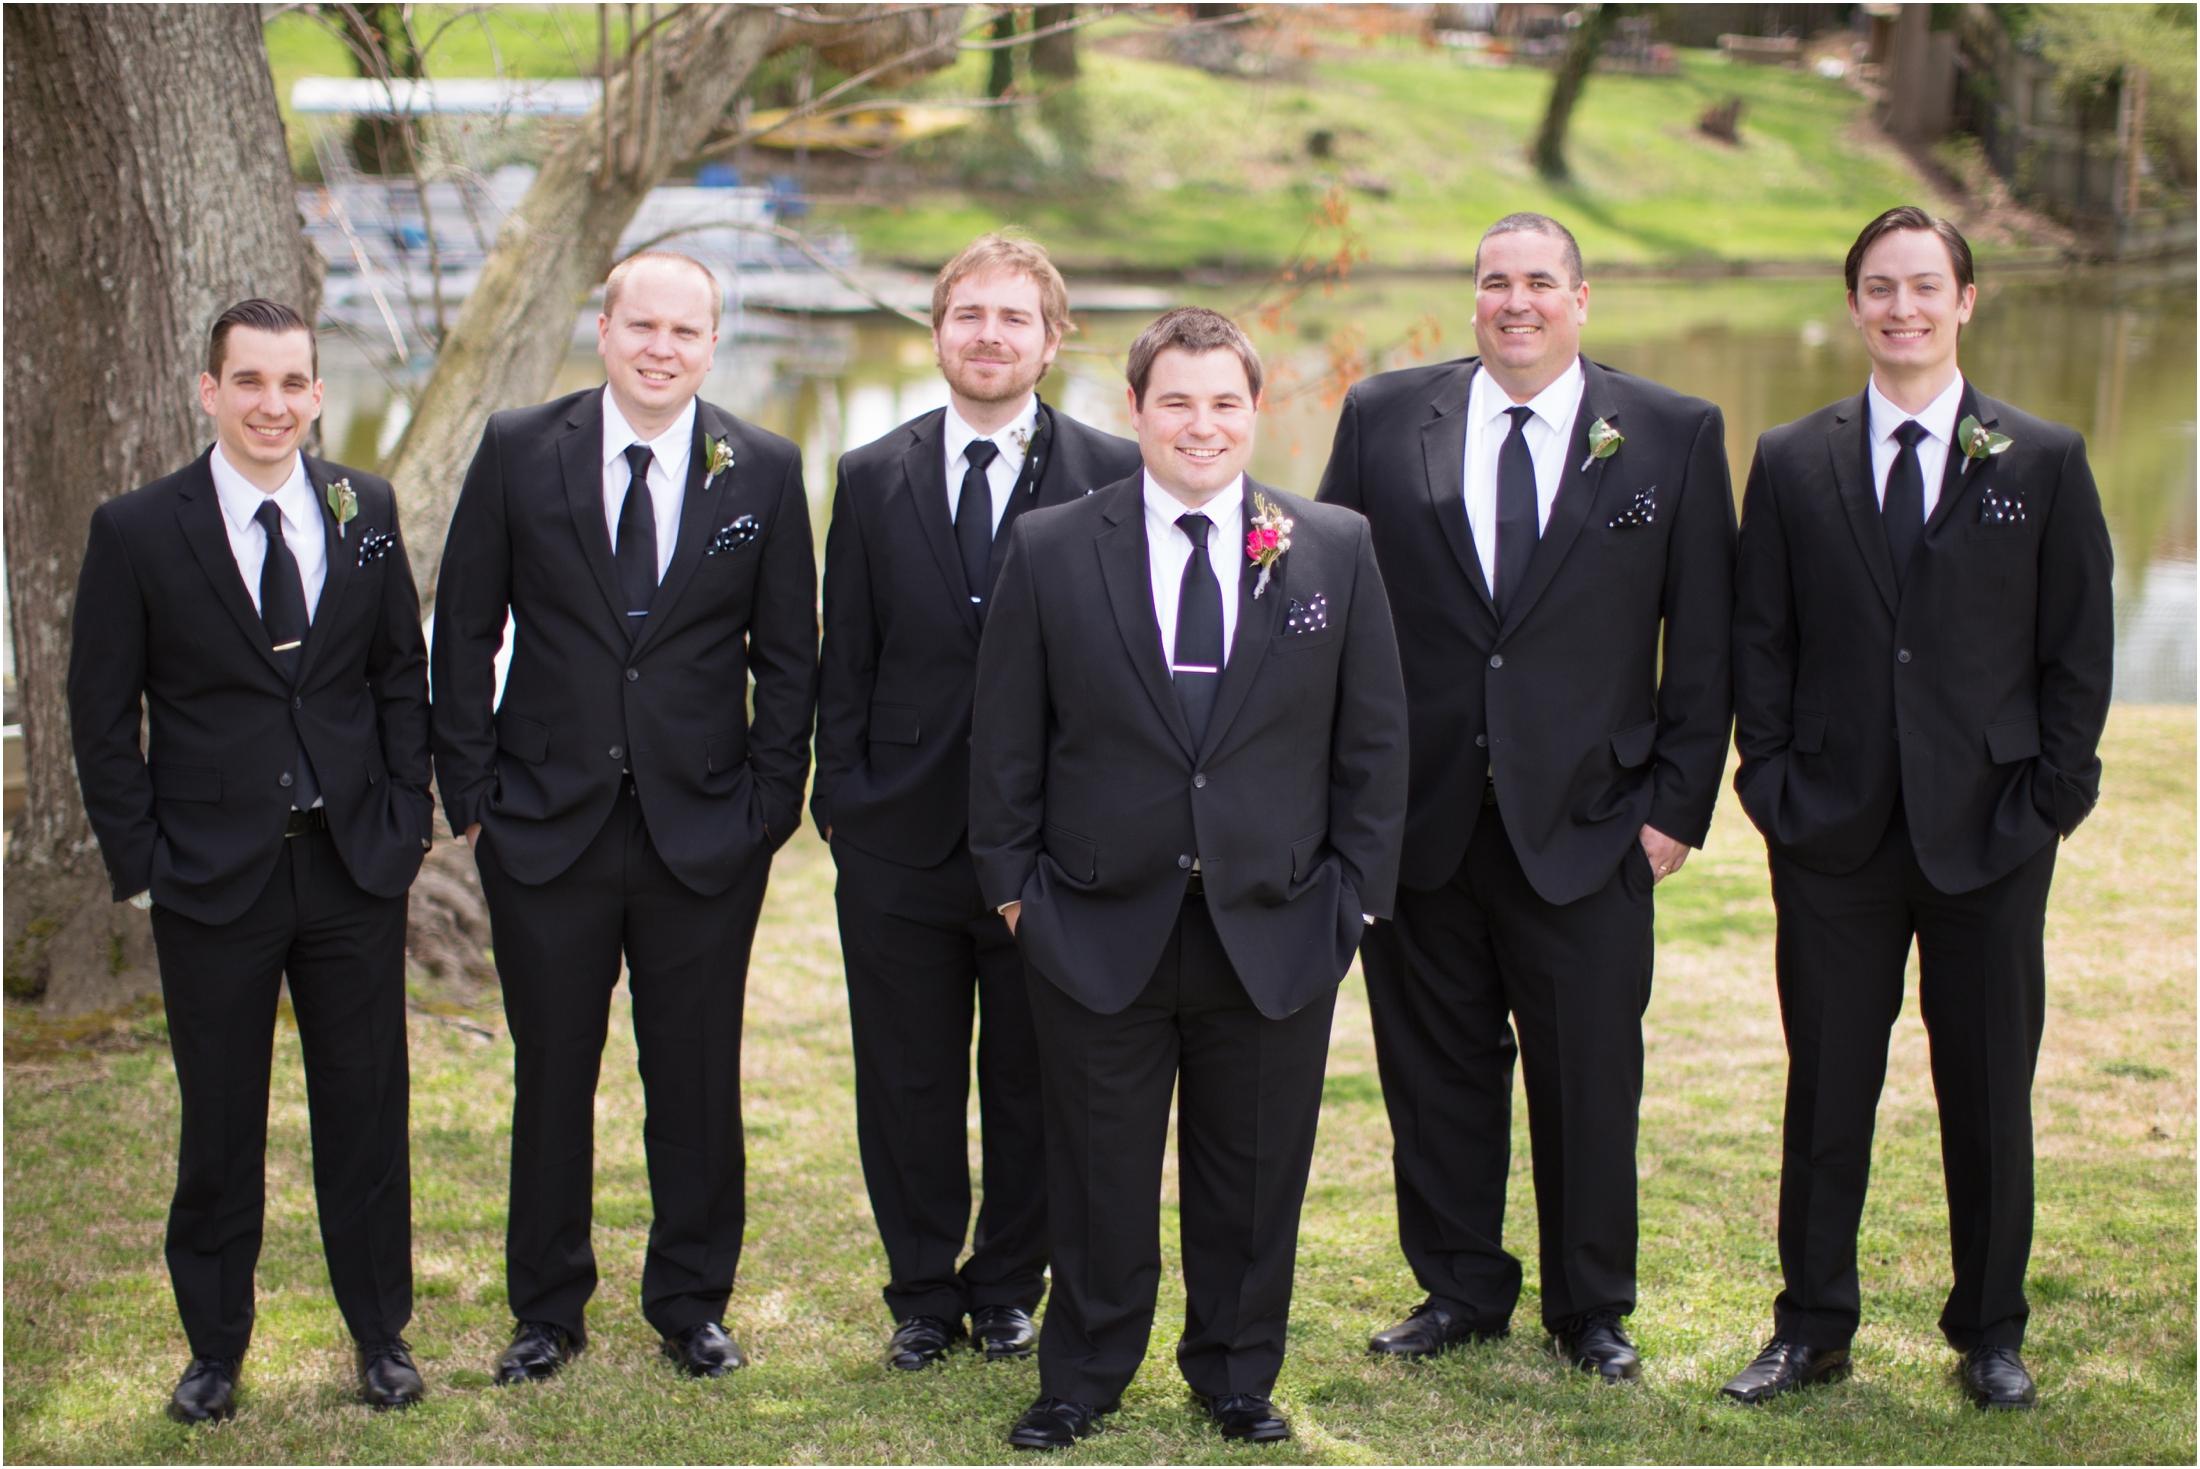 2-Lambert-Wedding-Bridal-Party-39.jpg